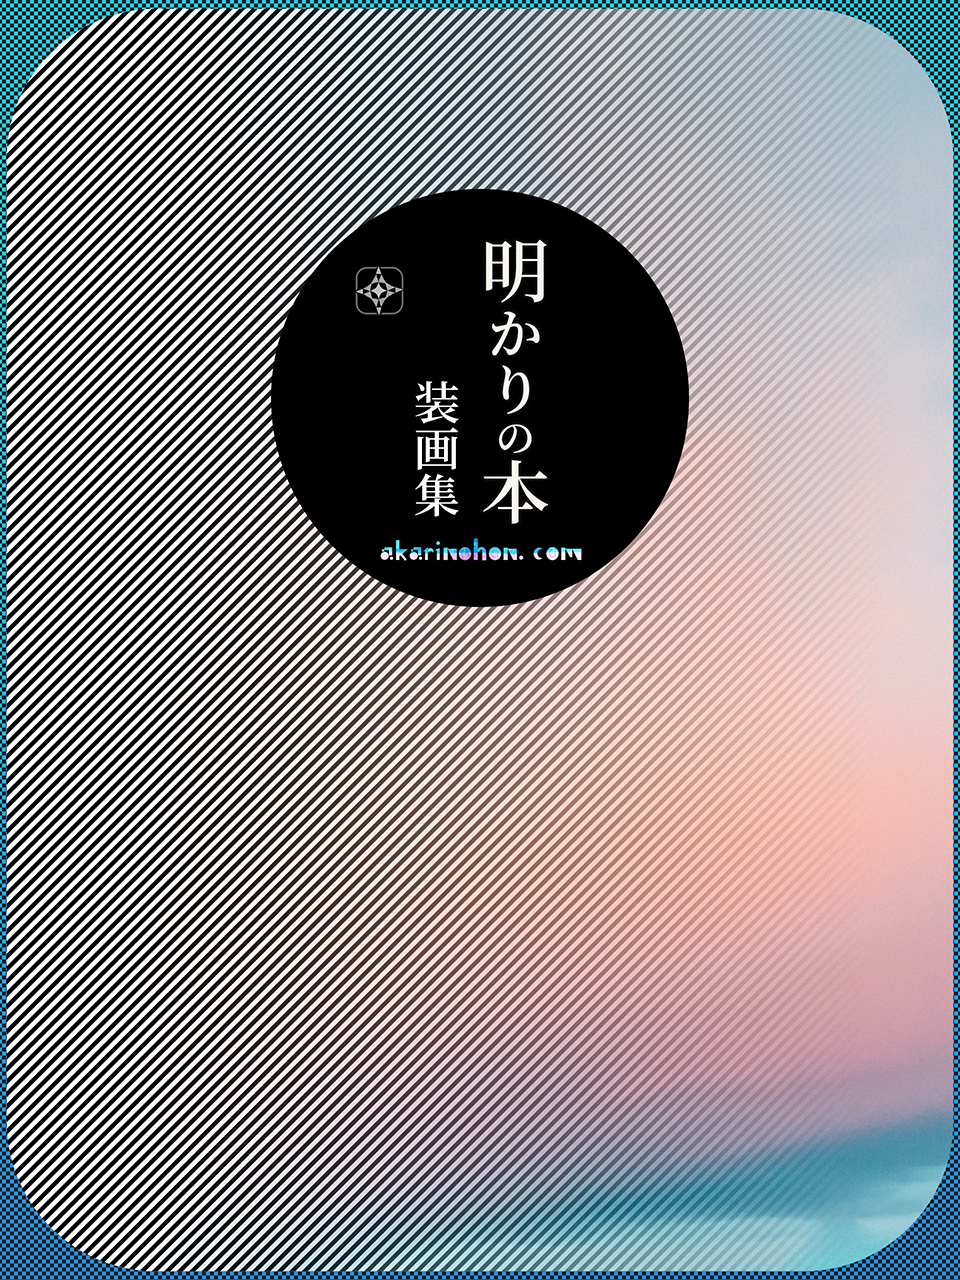 digitalbookartimagesono00352 - ドネーションウェアとは?